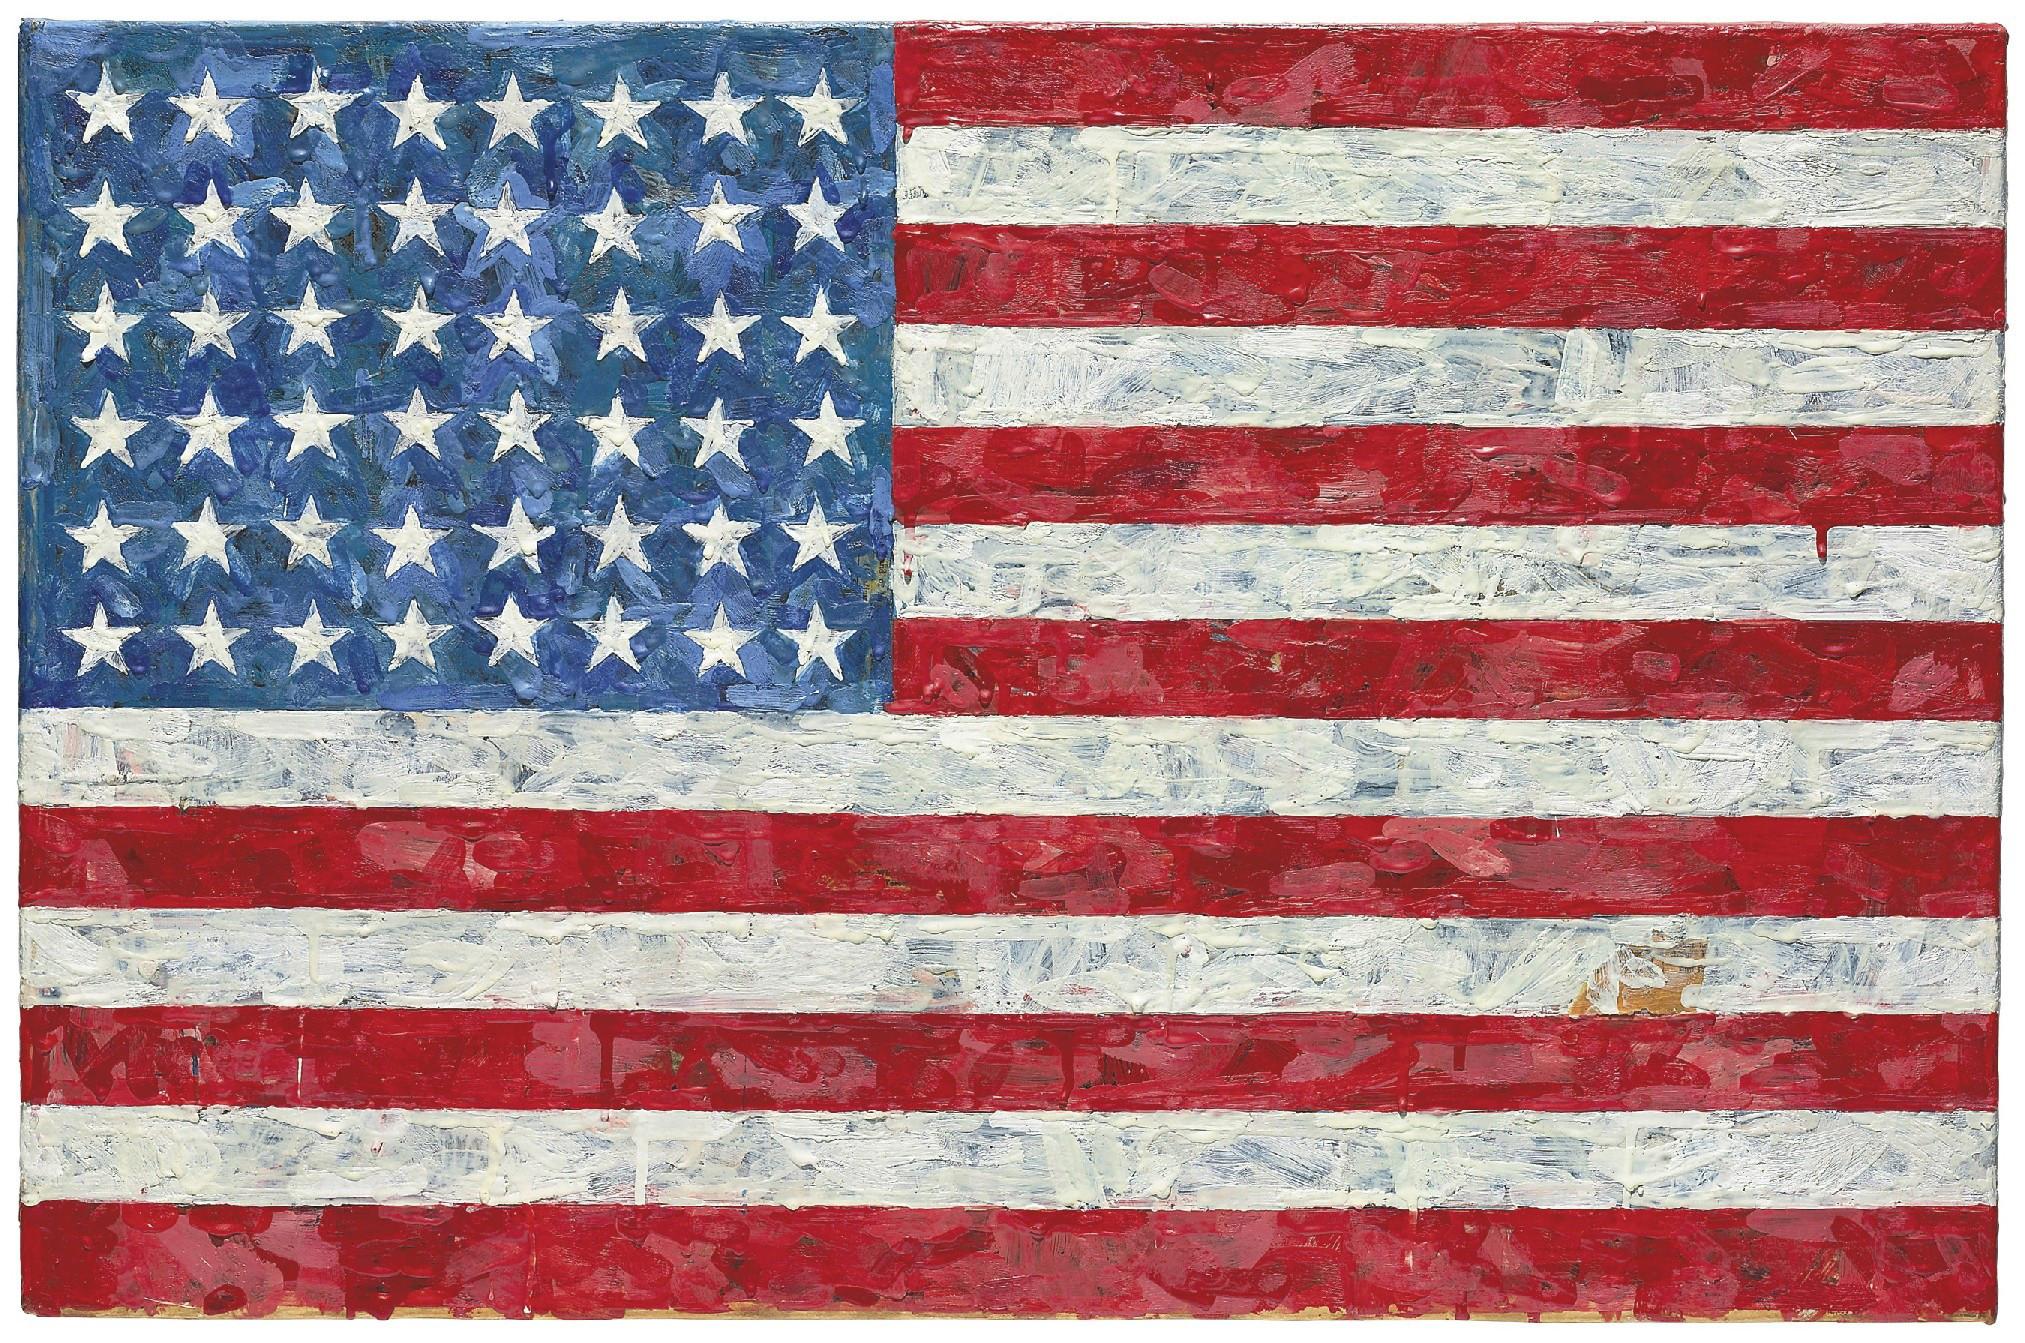 2013-07-02-AMERICANFLAGART_original.jpg